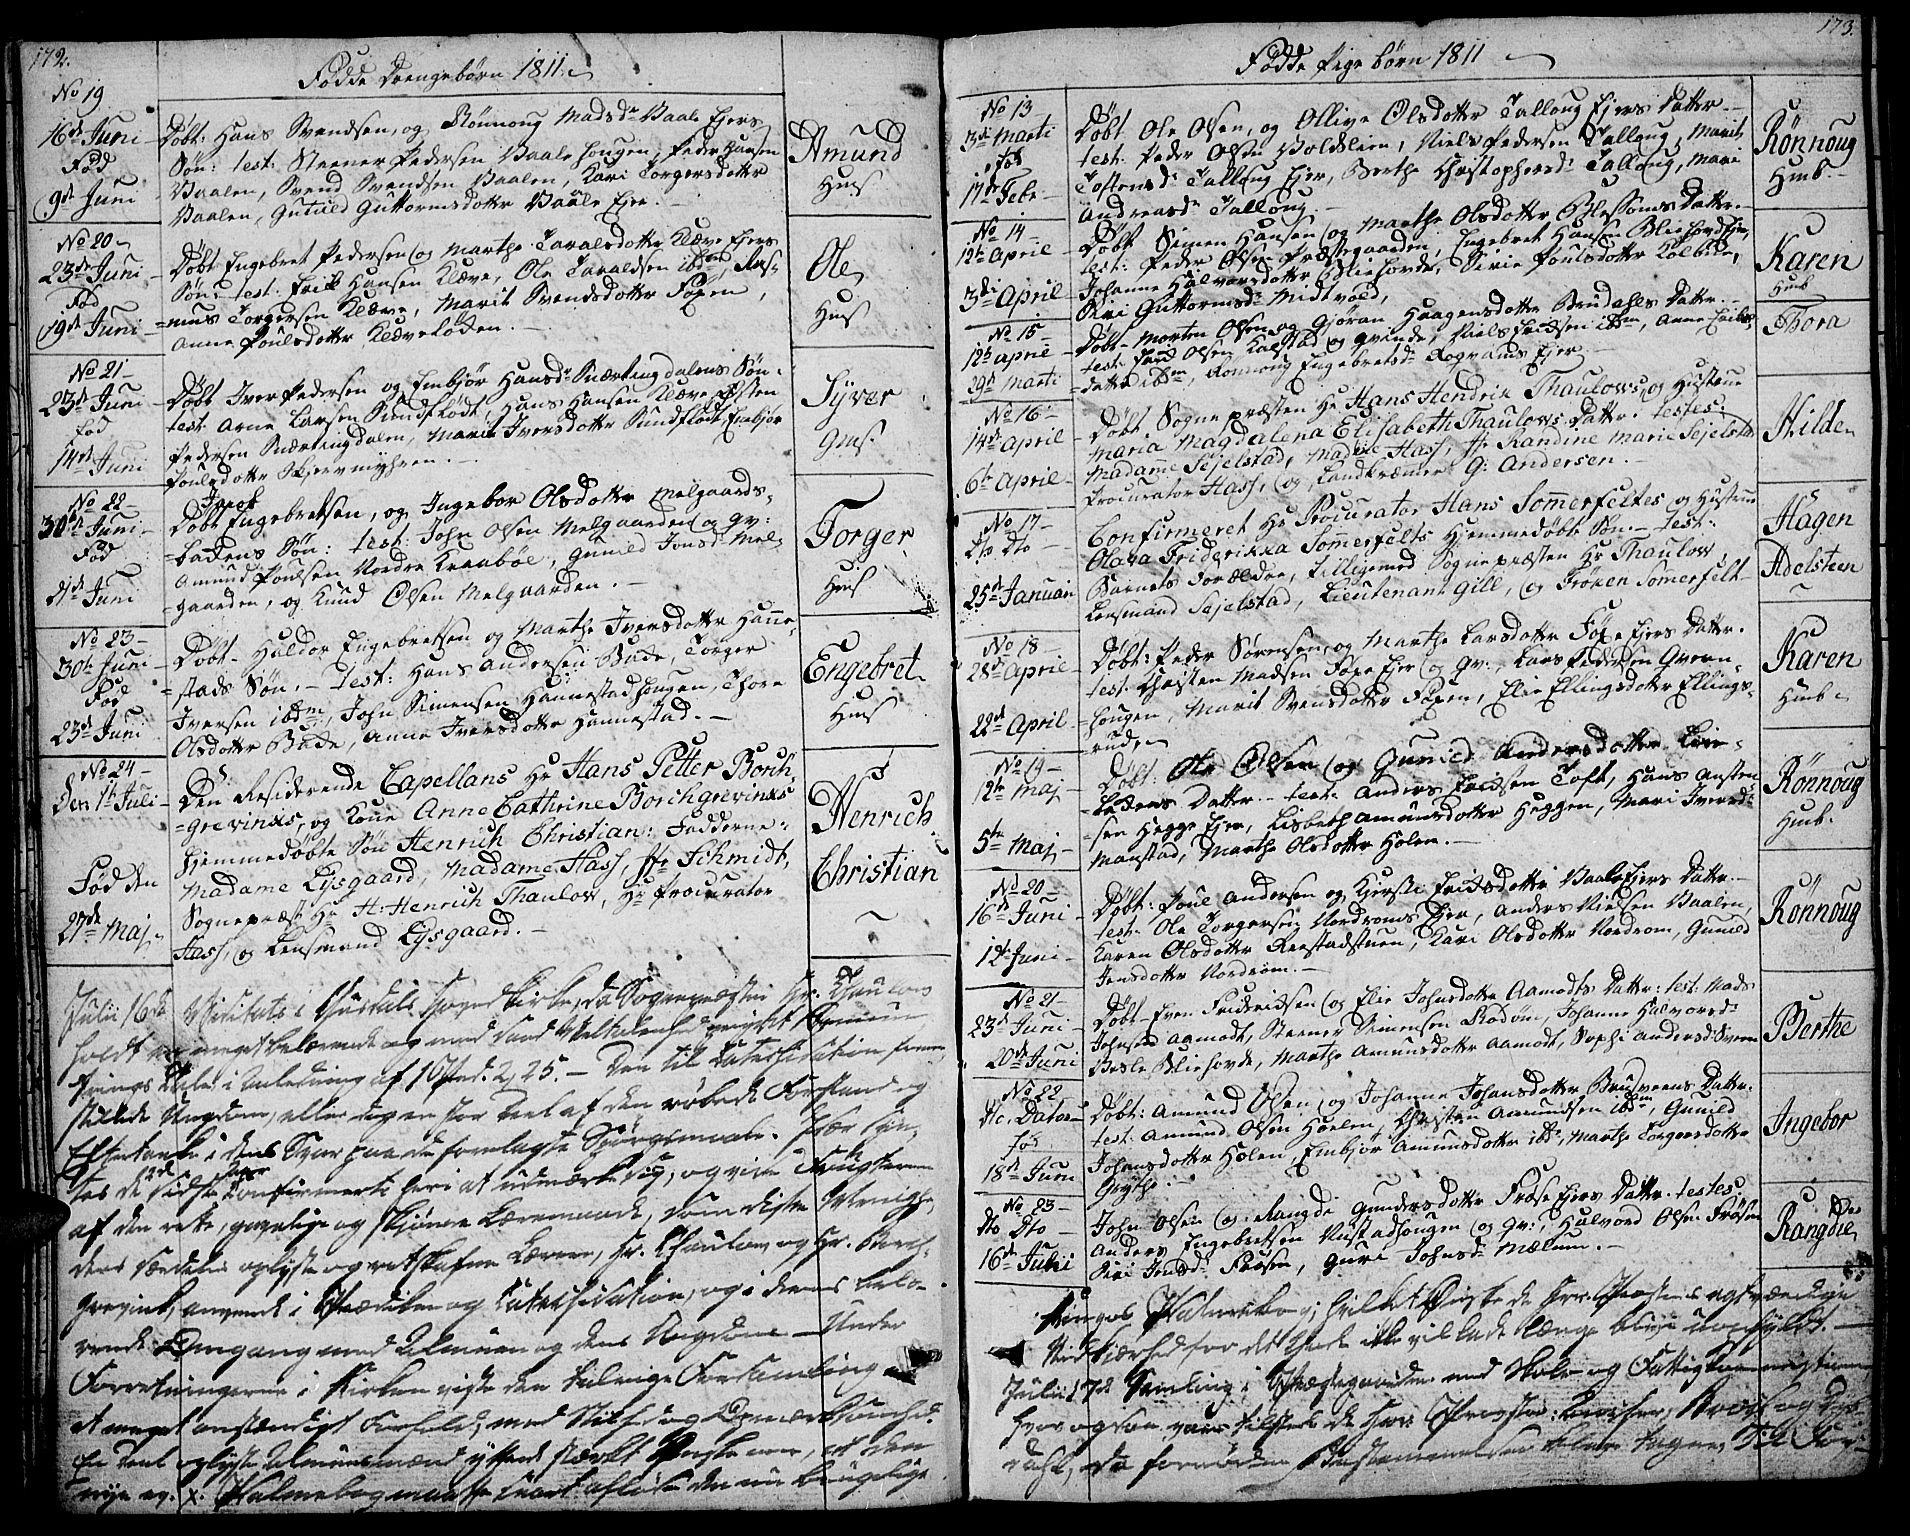 SAH, Gausdal prestekontor, Ministerialbok nr. 4, 1809-1817, s. 172-173